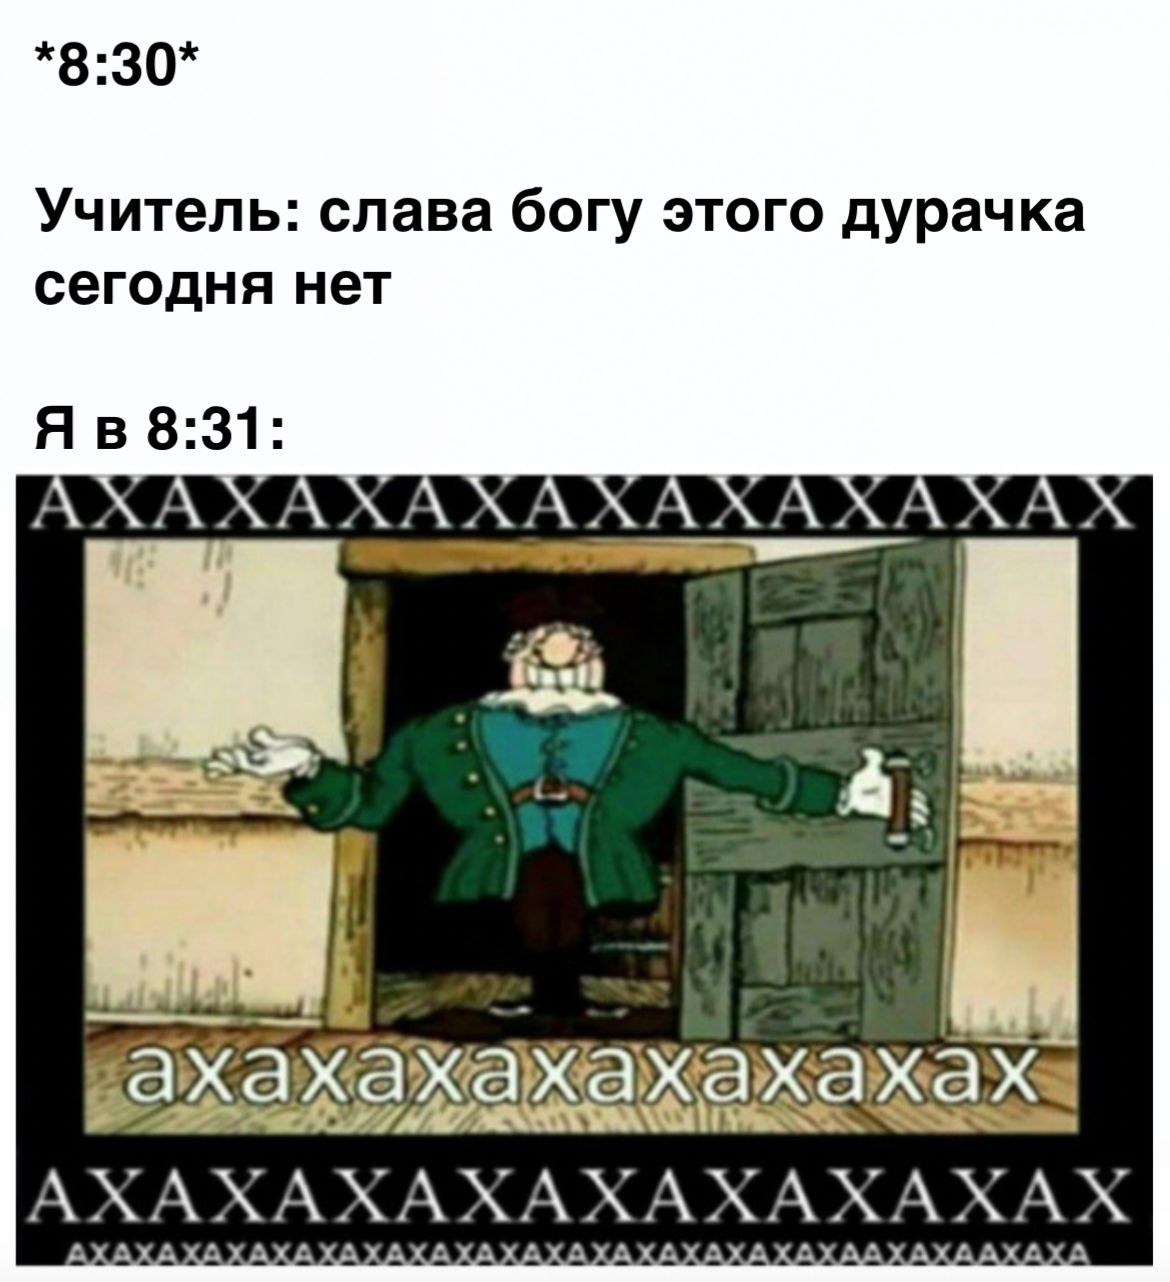 MHtebqVK0WE.jpg